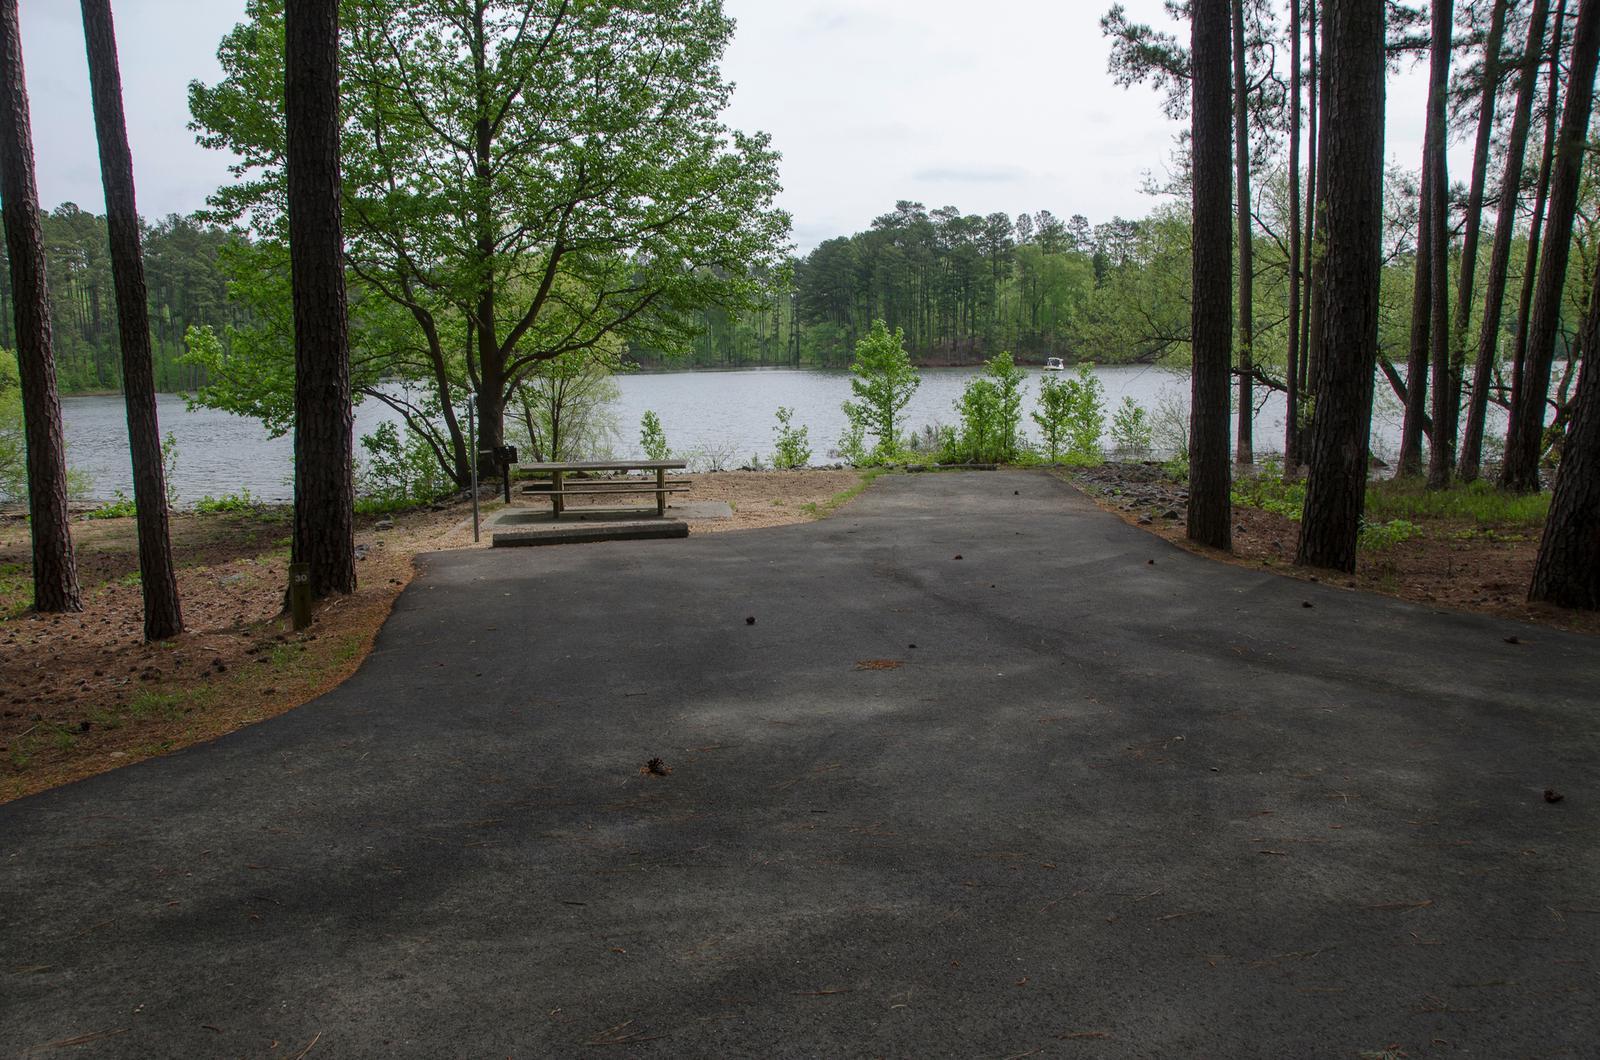 Driveway slopeMcKaskey Creek Campground, campsite #30